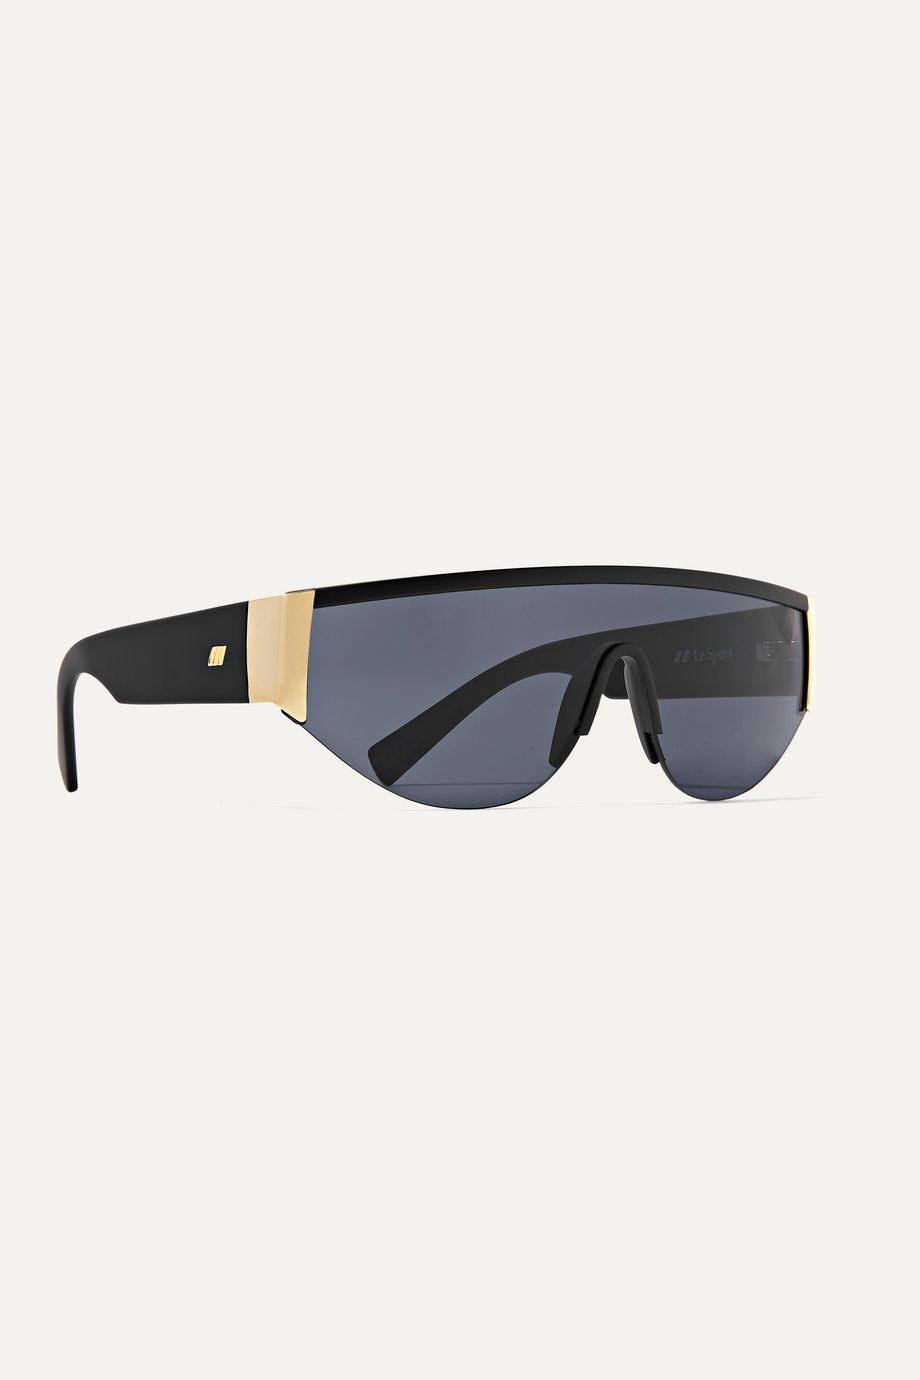 Le Specs Viper D-frame acetate and gold-tone sunglasses